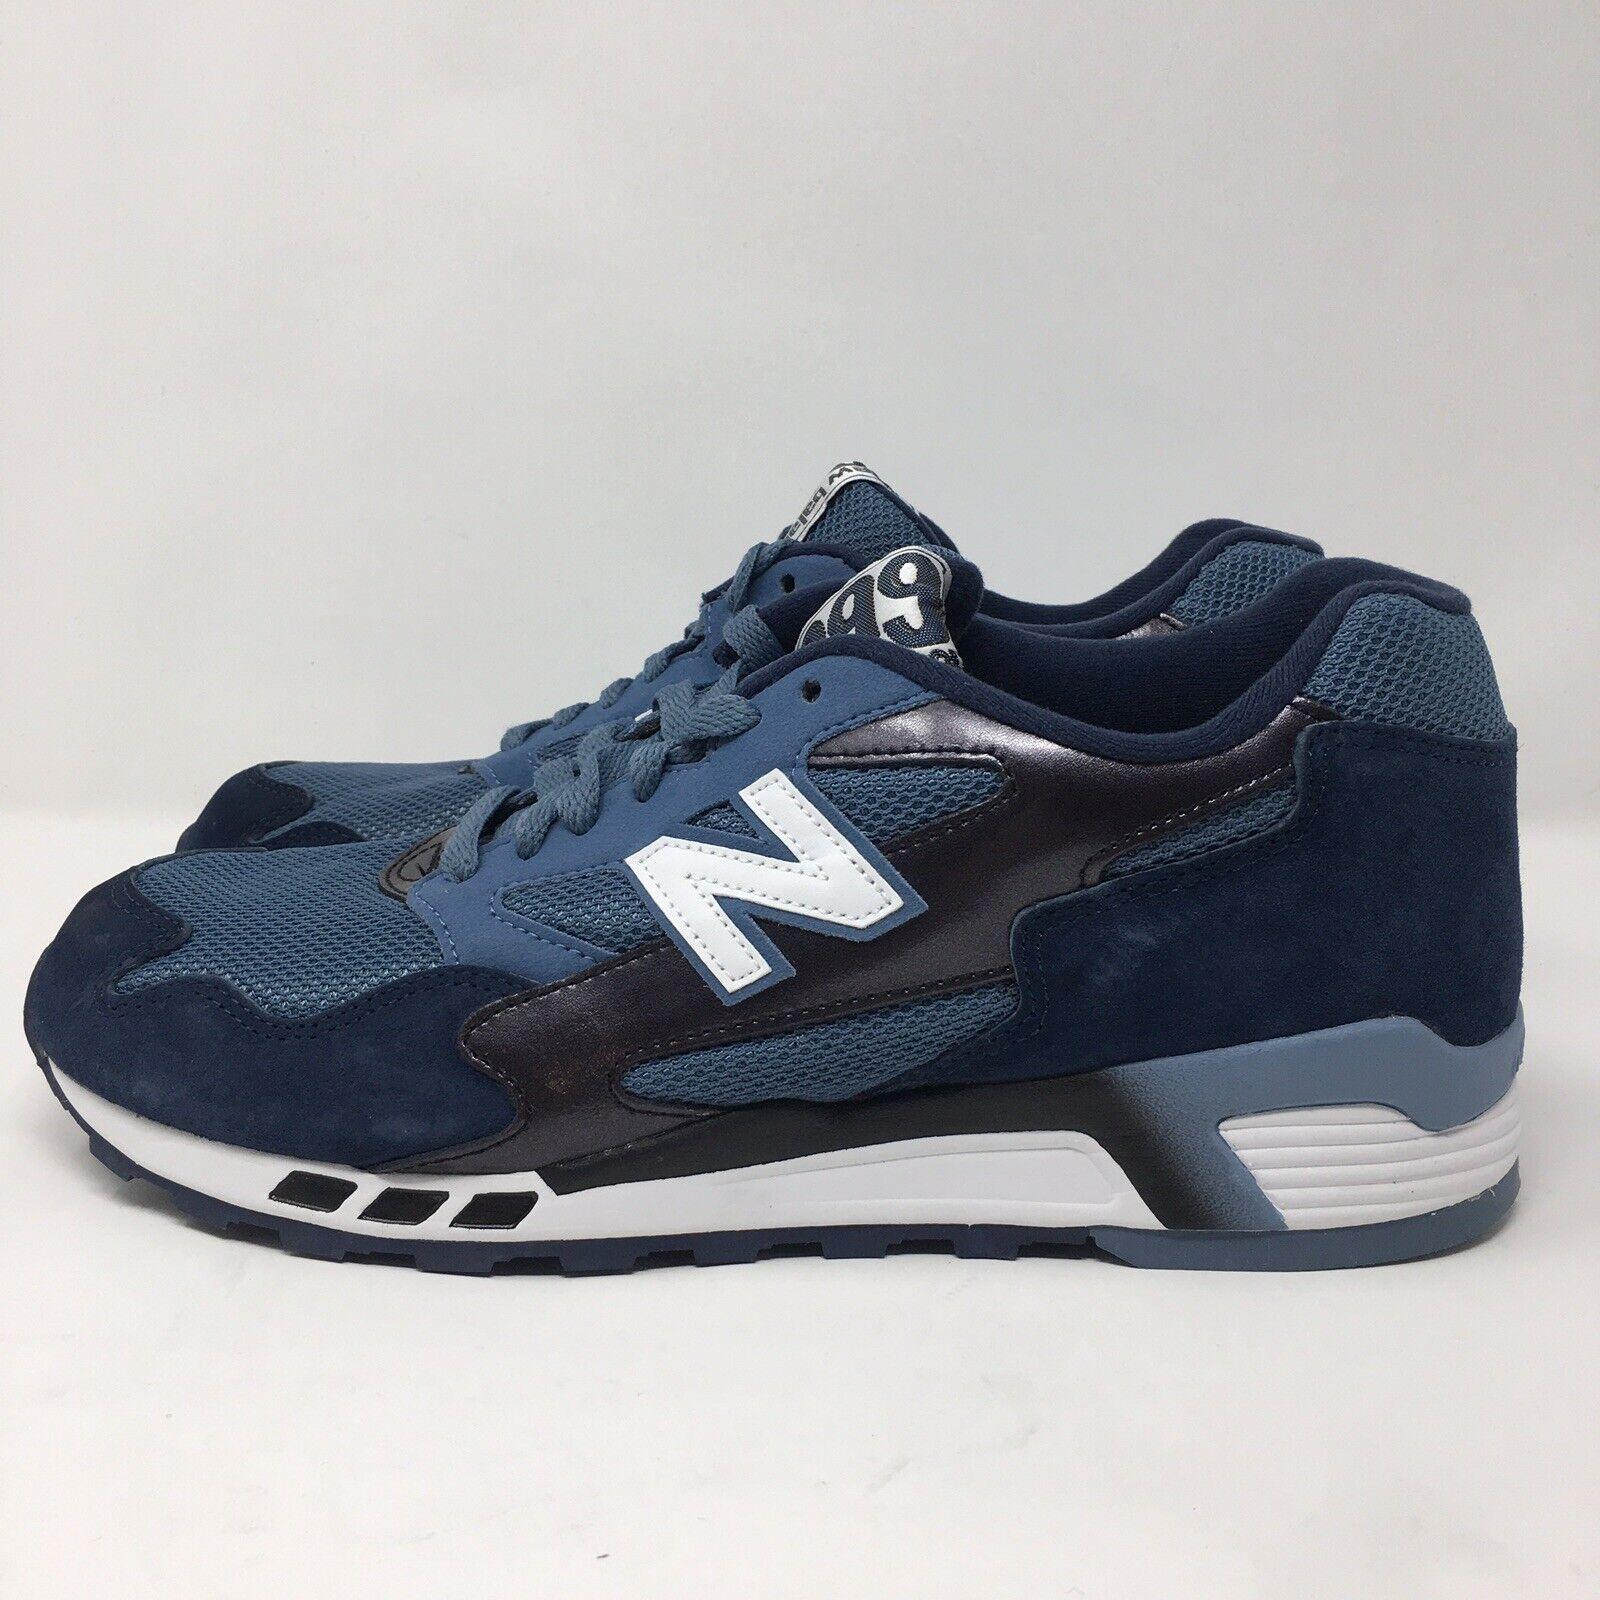 New Balance 660 ML660PRA Men's bluee Suede Running shoes Sz 10 Rare